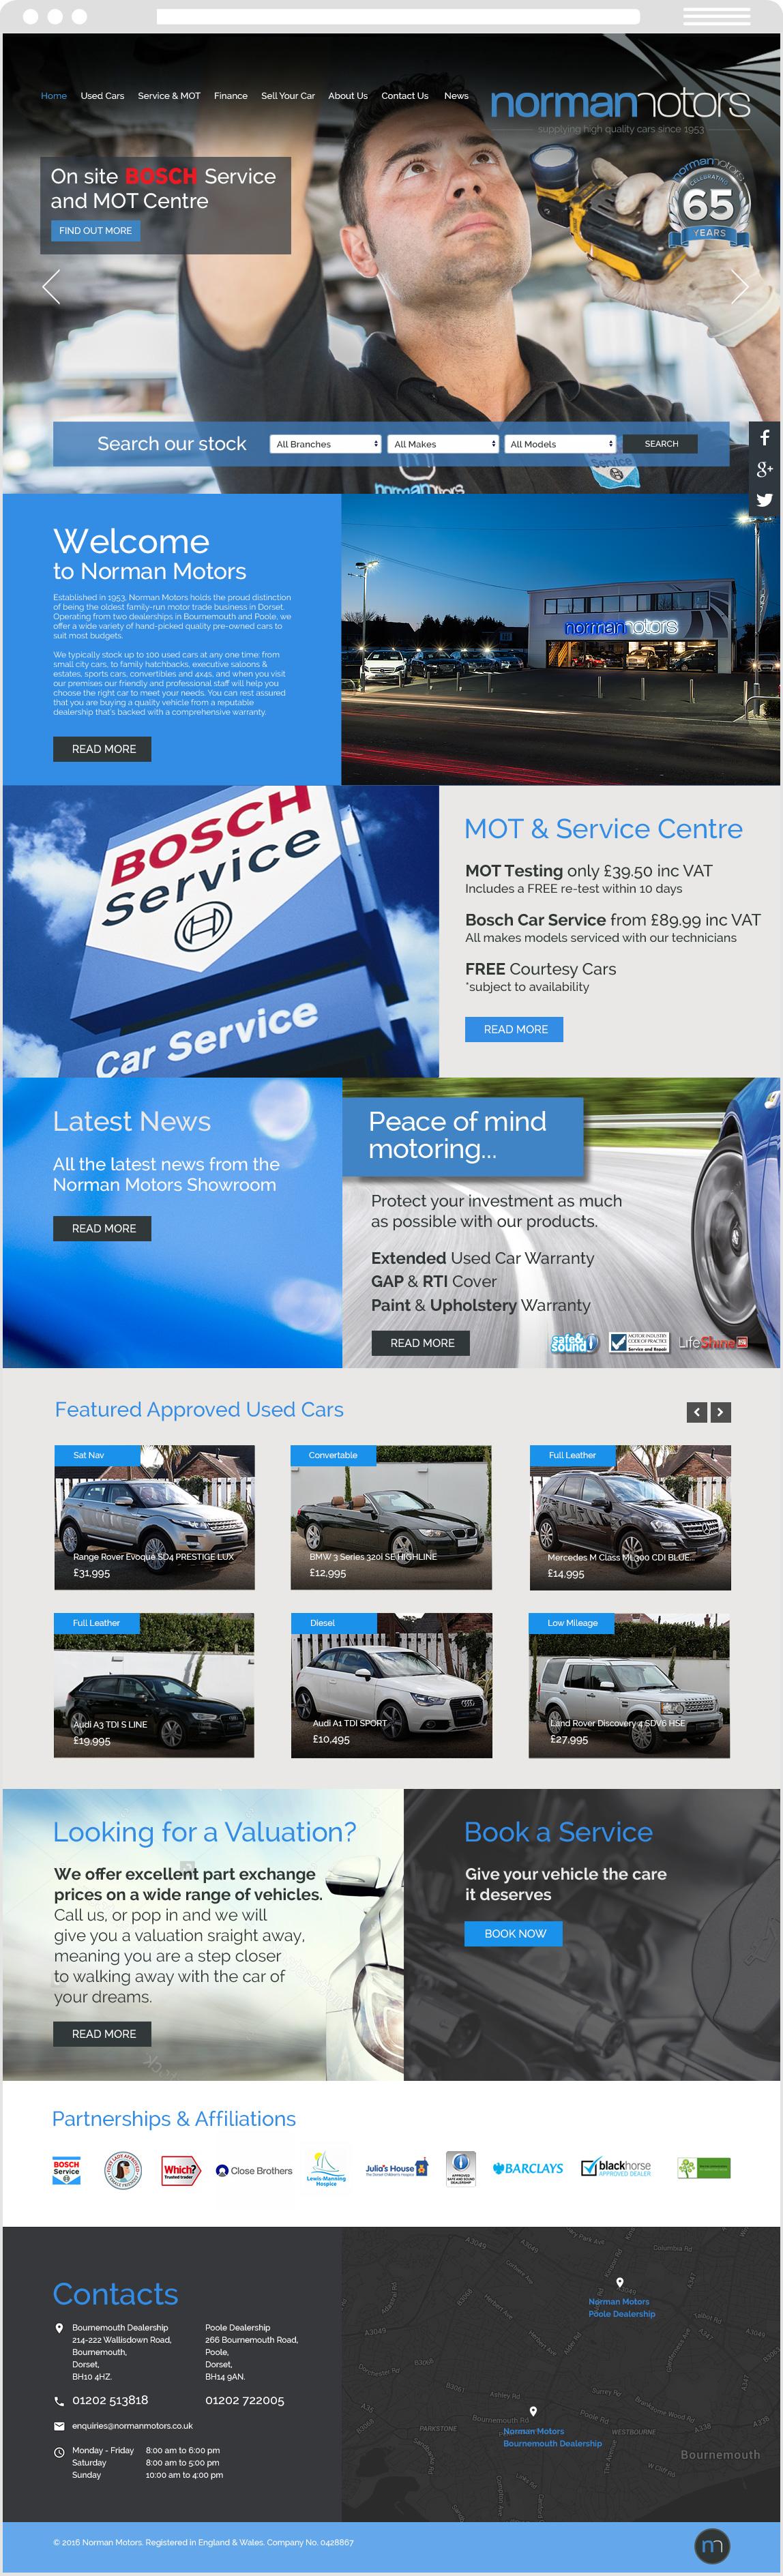 fundamental-design-car-showroom-website-design.jpg